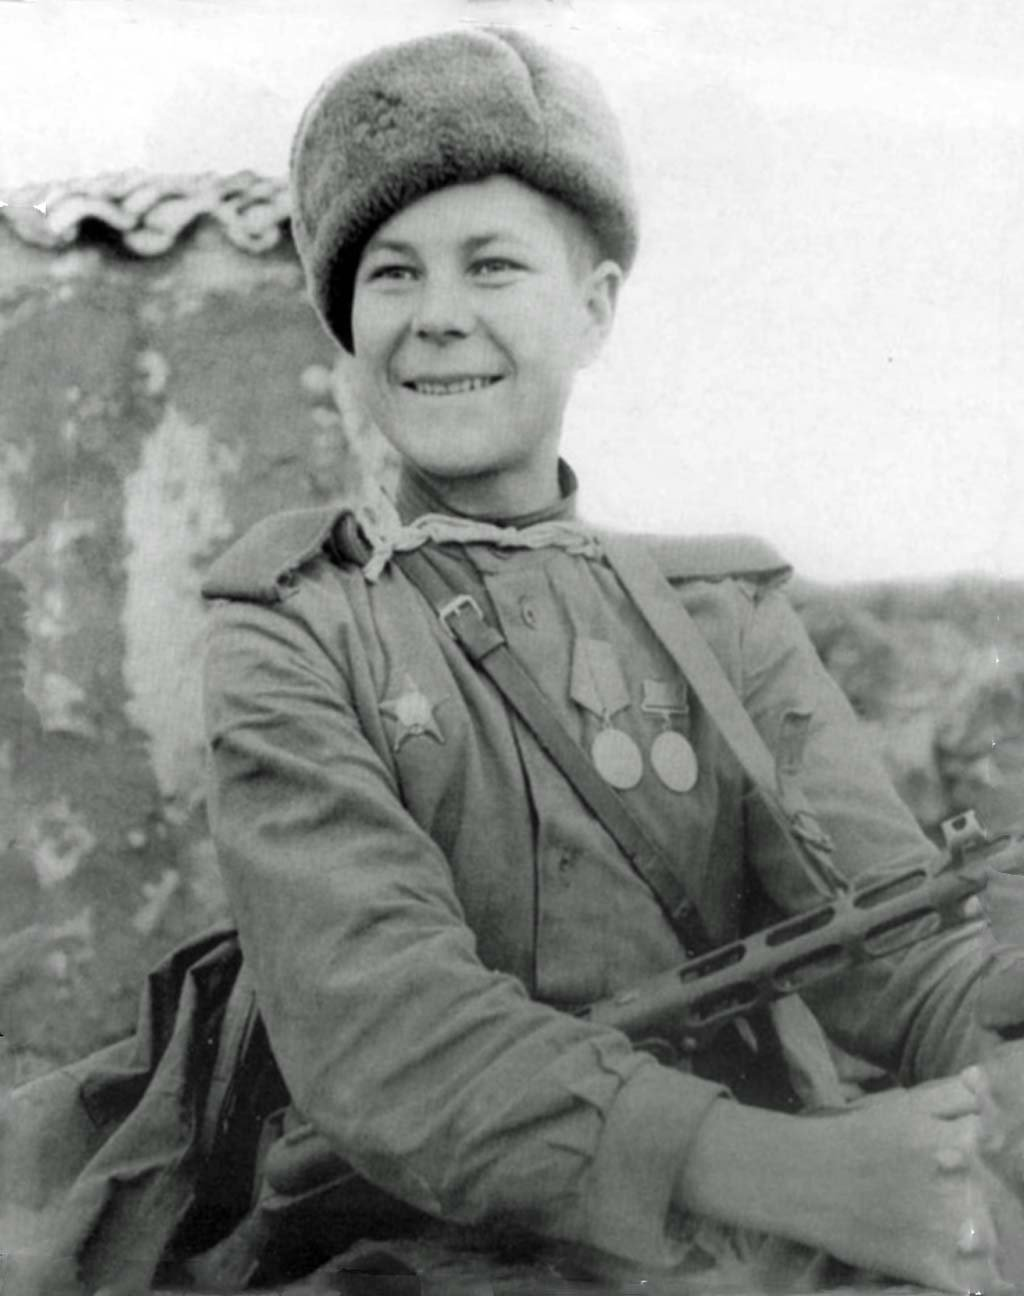 Vladimir Gik